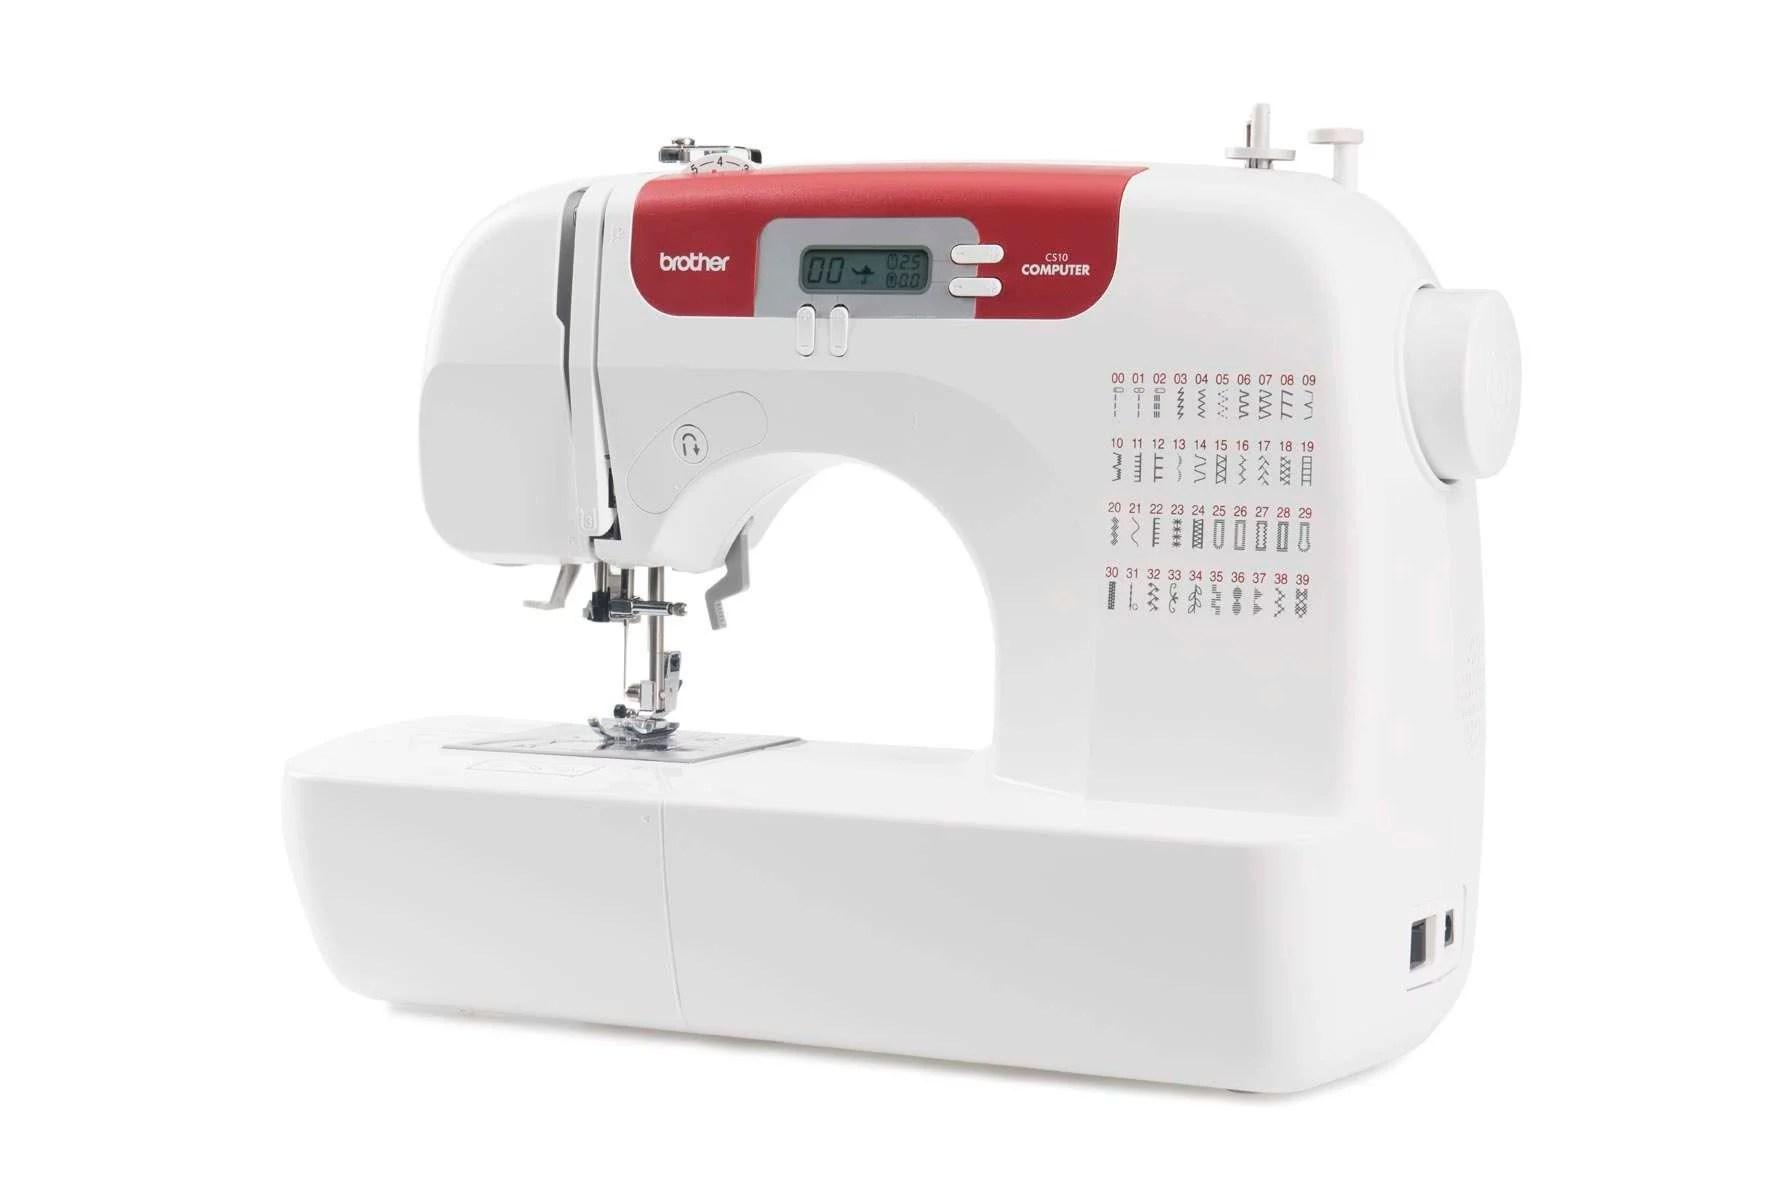 Máquina de coser electrónica BROTHER CS10 - Grupo FB